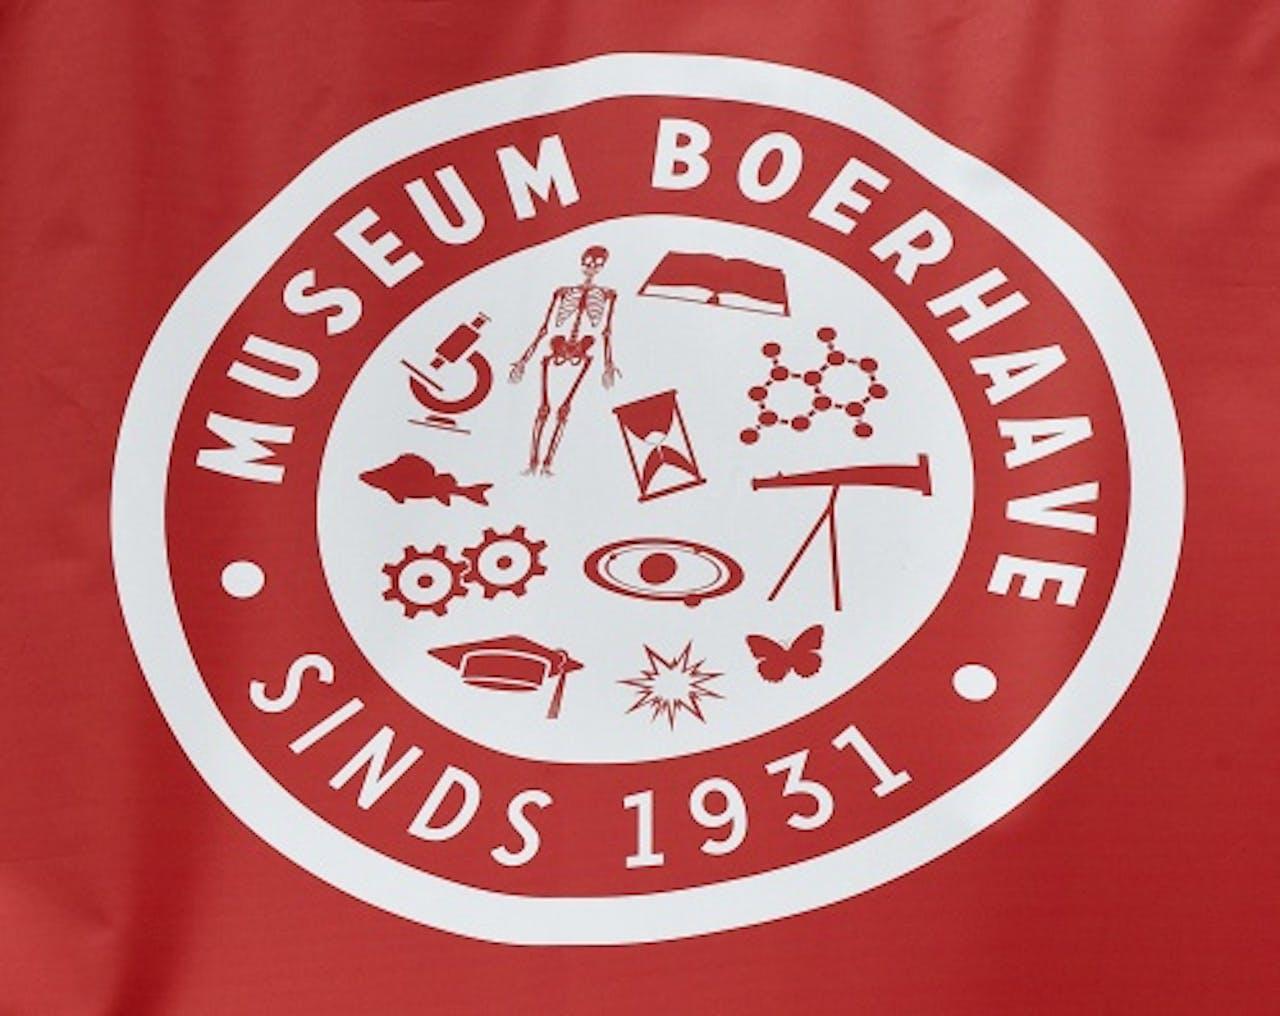 Museum Boerhaave. ANP